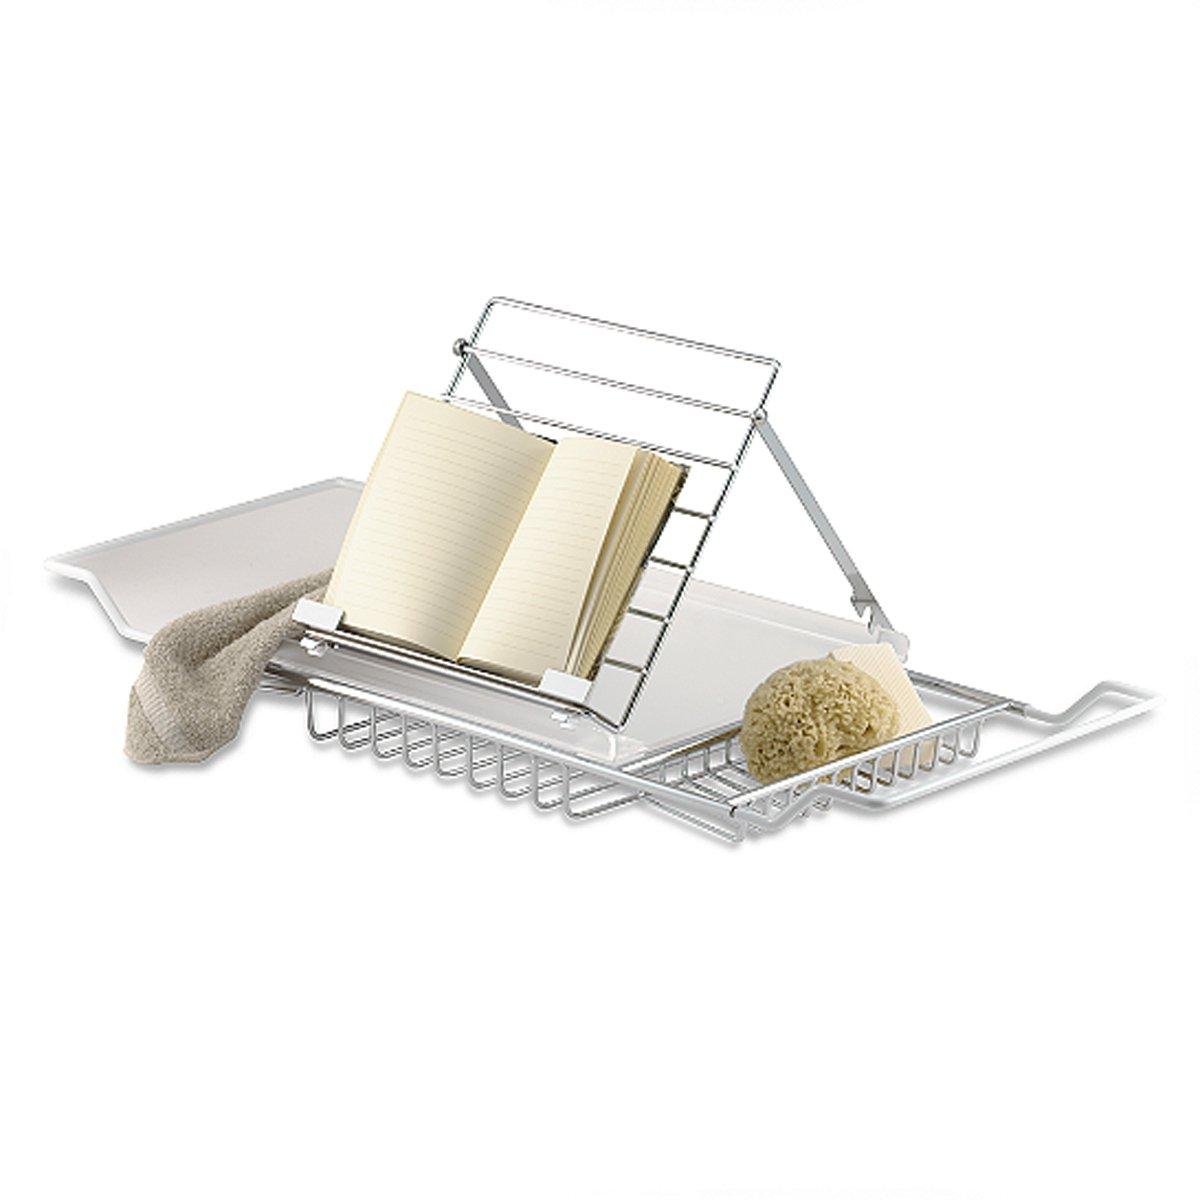 945b721512f Amazon.com  Jumbo Chrome Plated Bathtub Caddy  Home   Kitchen